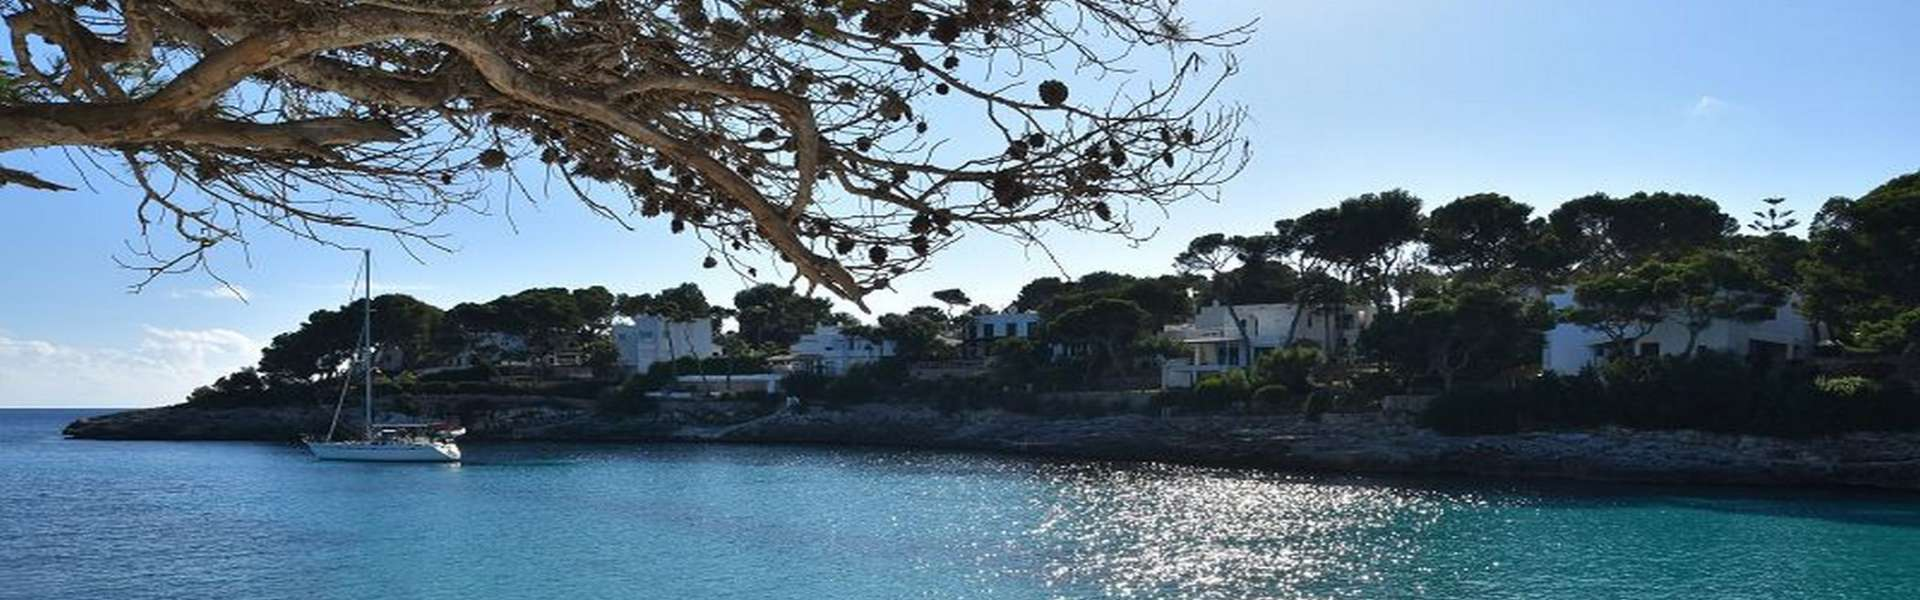 Baugrundstück in erster Meereslinie und Strandzugang in Cala d'Or